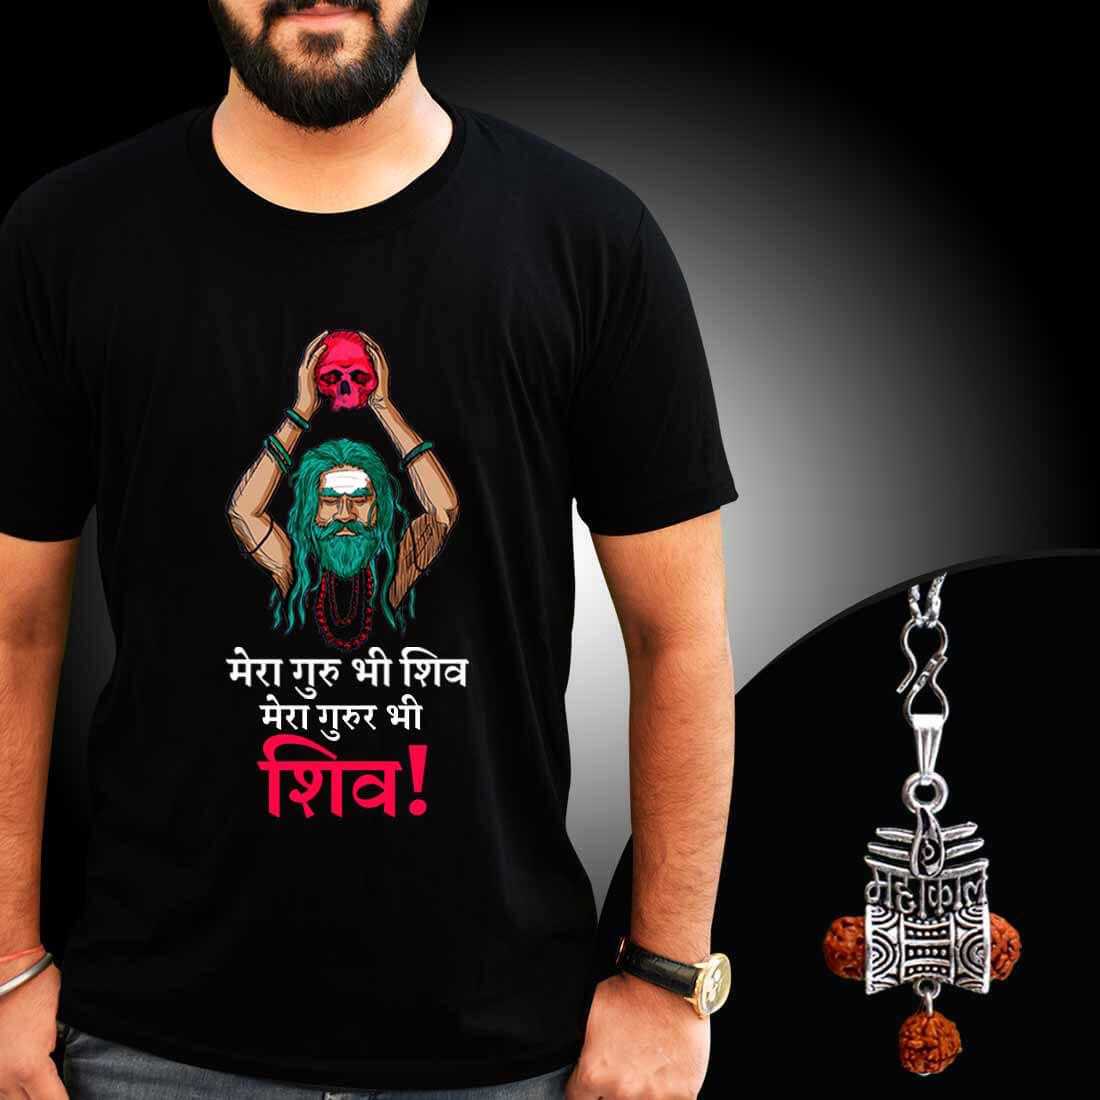 Shiva Quotes Printed T-Shirt Combo WIth Mahakal Locket